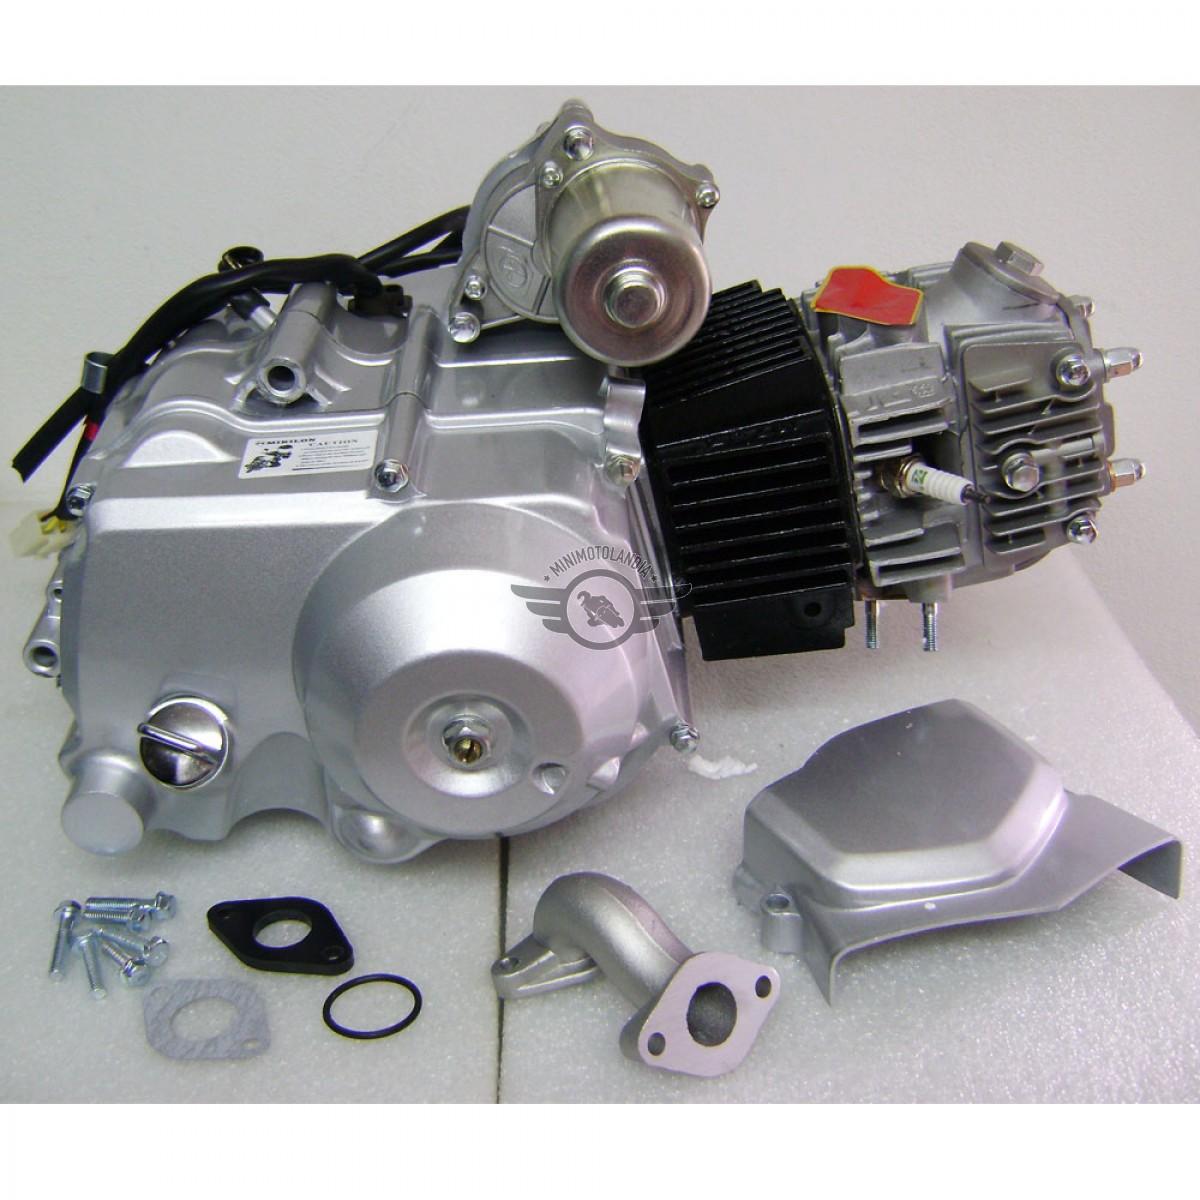 Schema Elettrico Quad 110 : Motore cc automatico t senza retromarcia quad atv minimotolandia